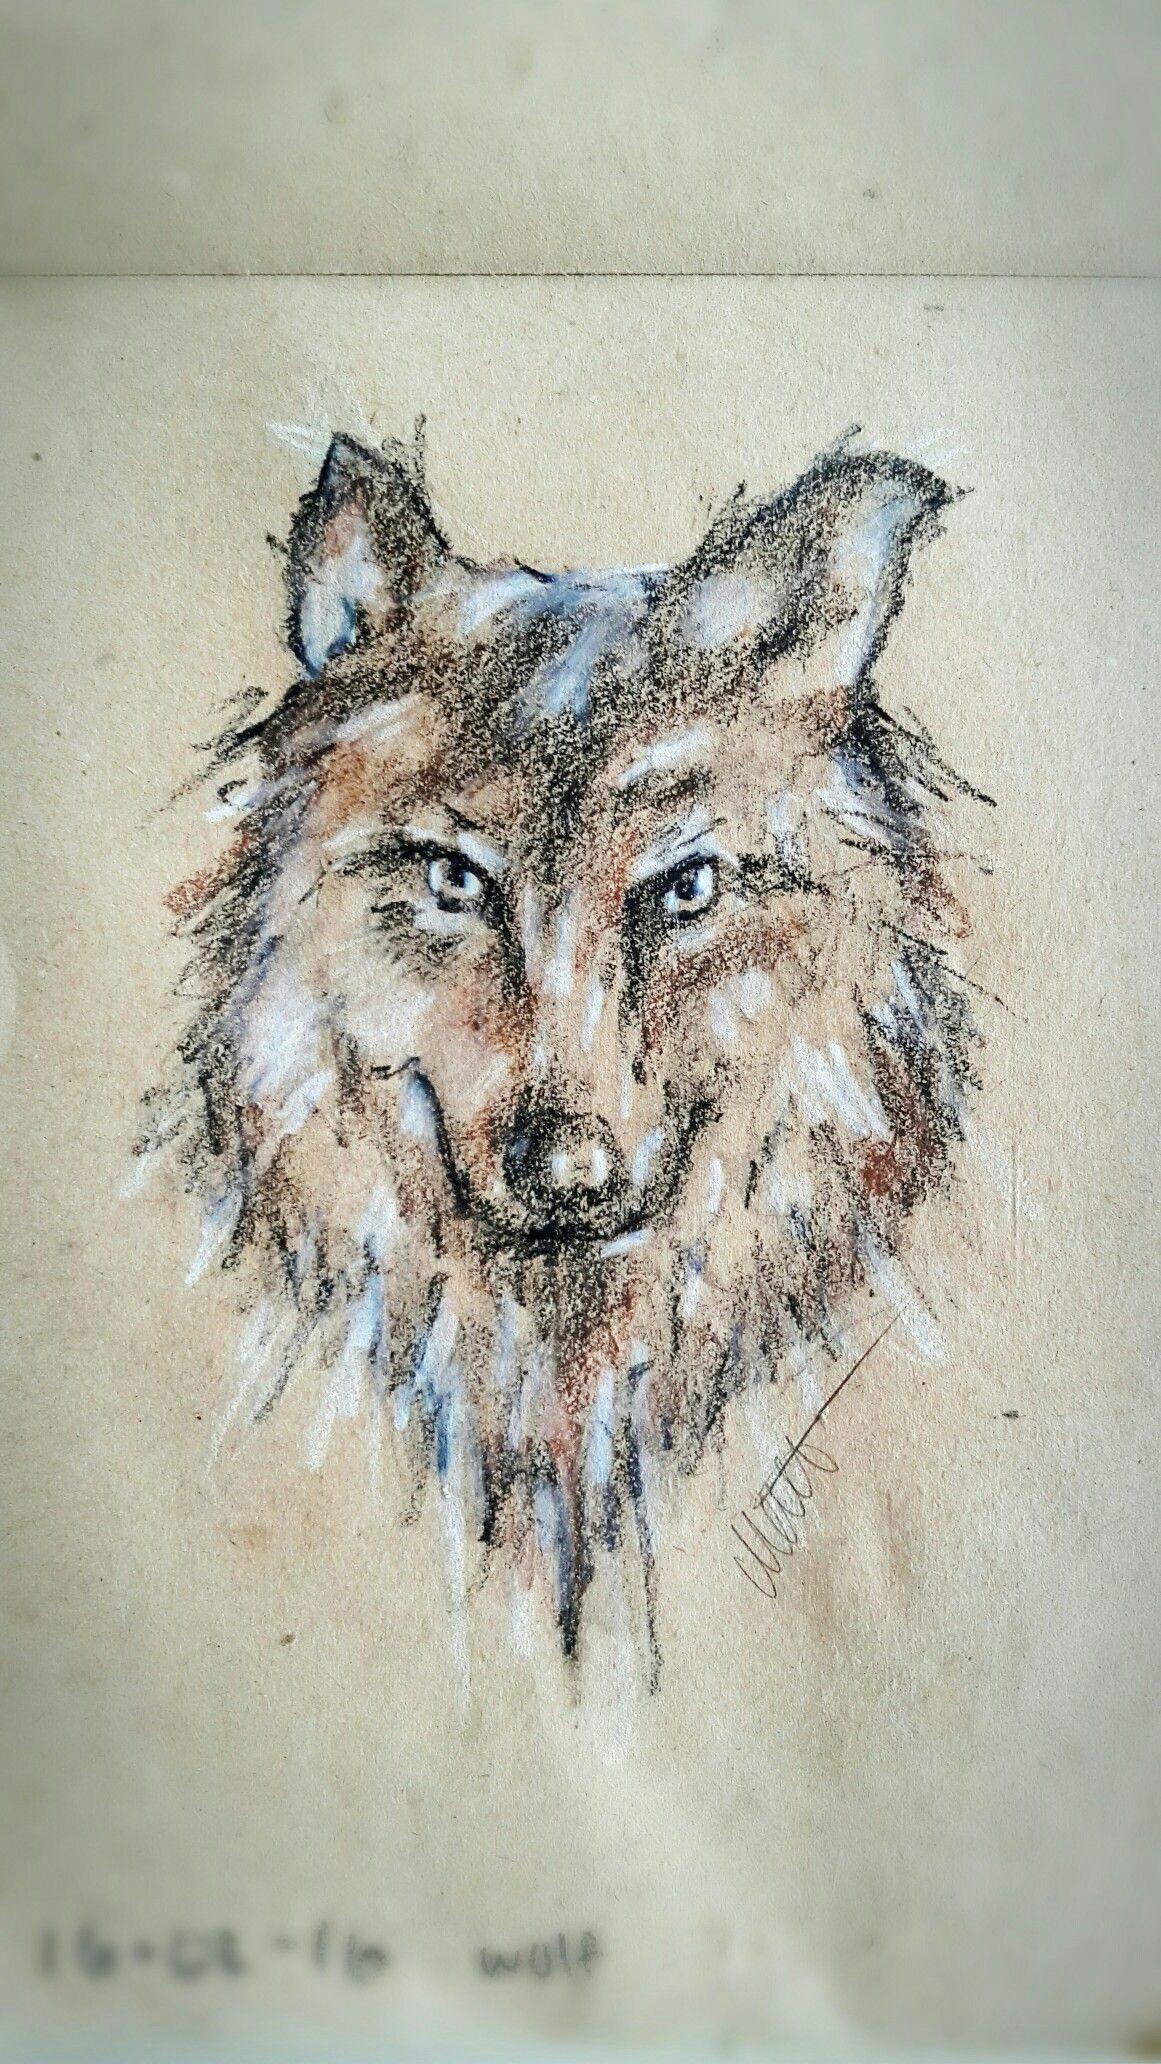 wolf drawing in crayons crayon drawings crayons watercolor art pastels wolf